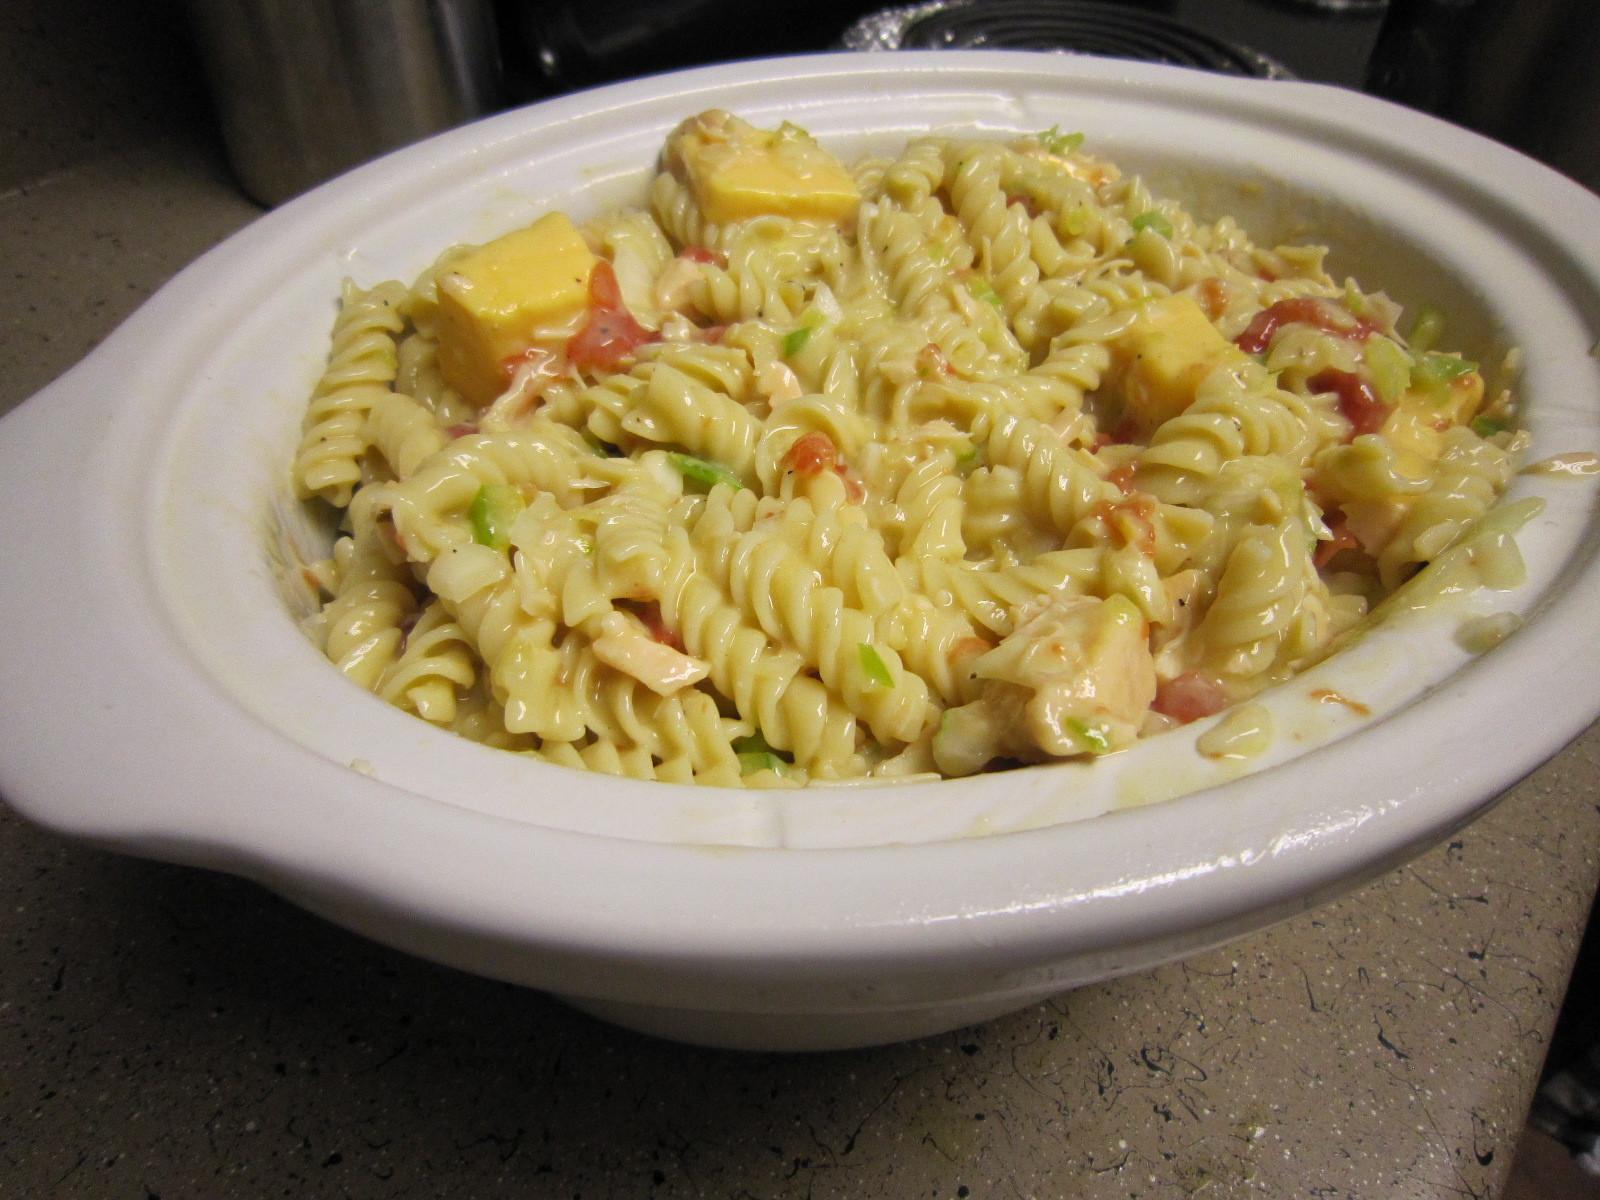 Crockpot Chicken Spaghetti  Living a Changed Life Recipe Review Crockpot Cheesy